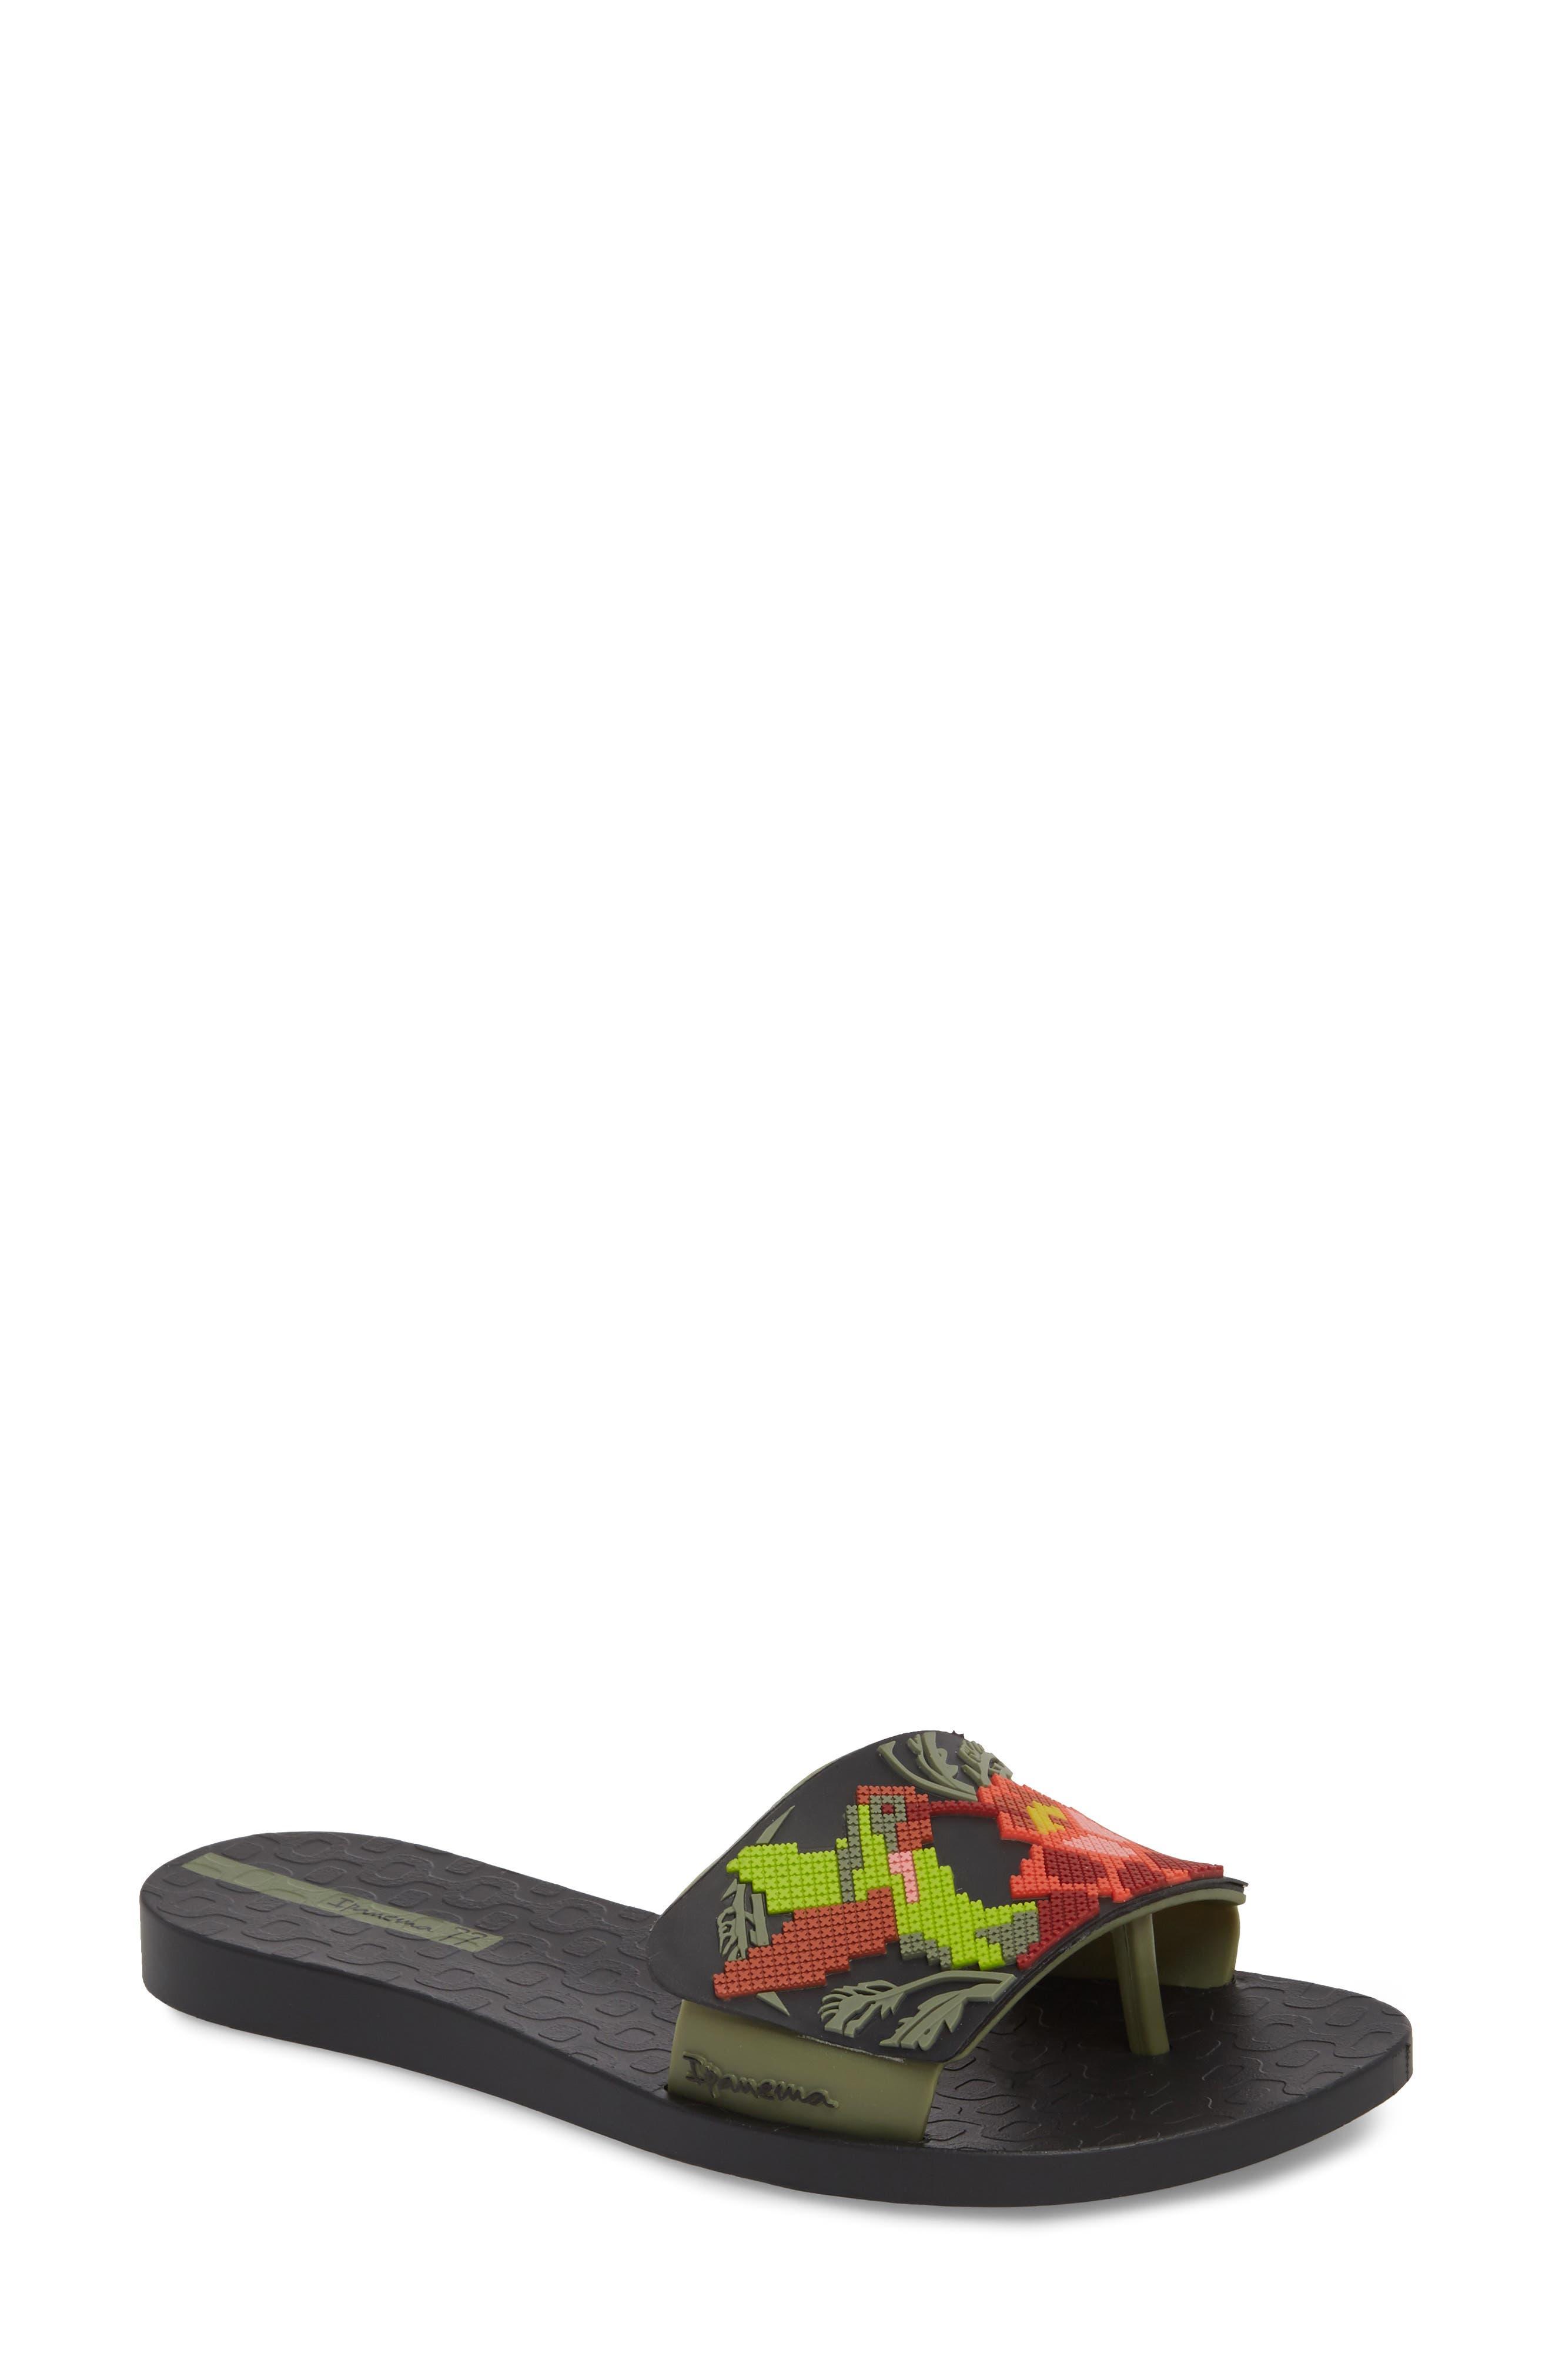 Nectar Floral Slide Sandal,                             Main thumbnail 1, color,                             BLACK/ GREEN